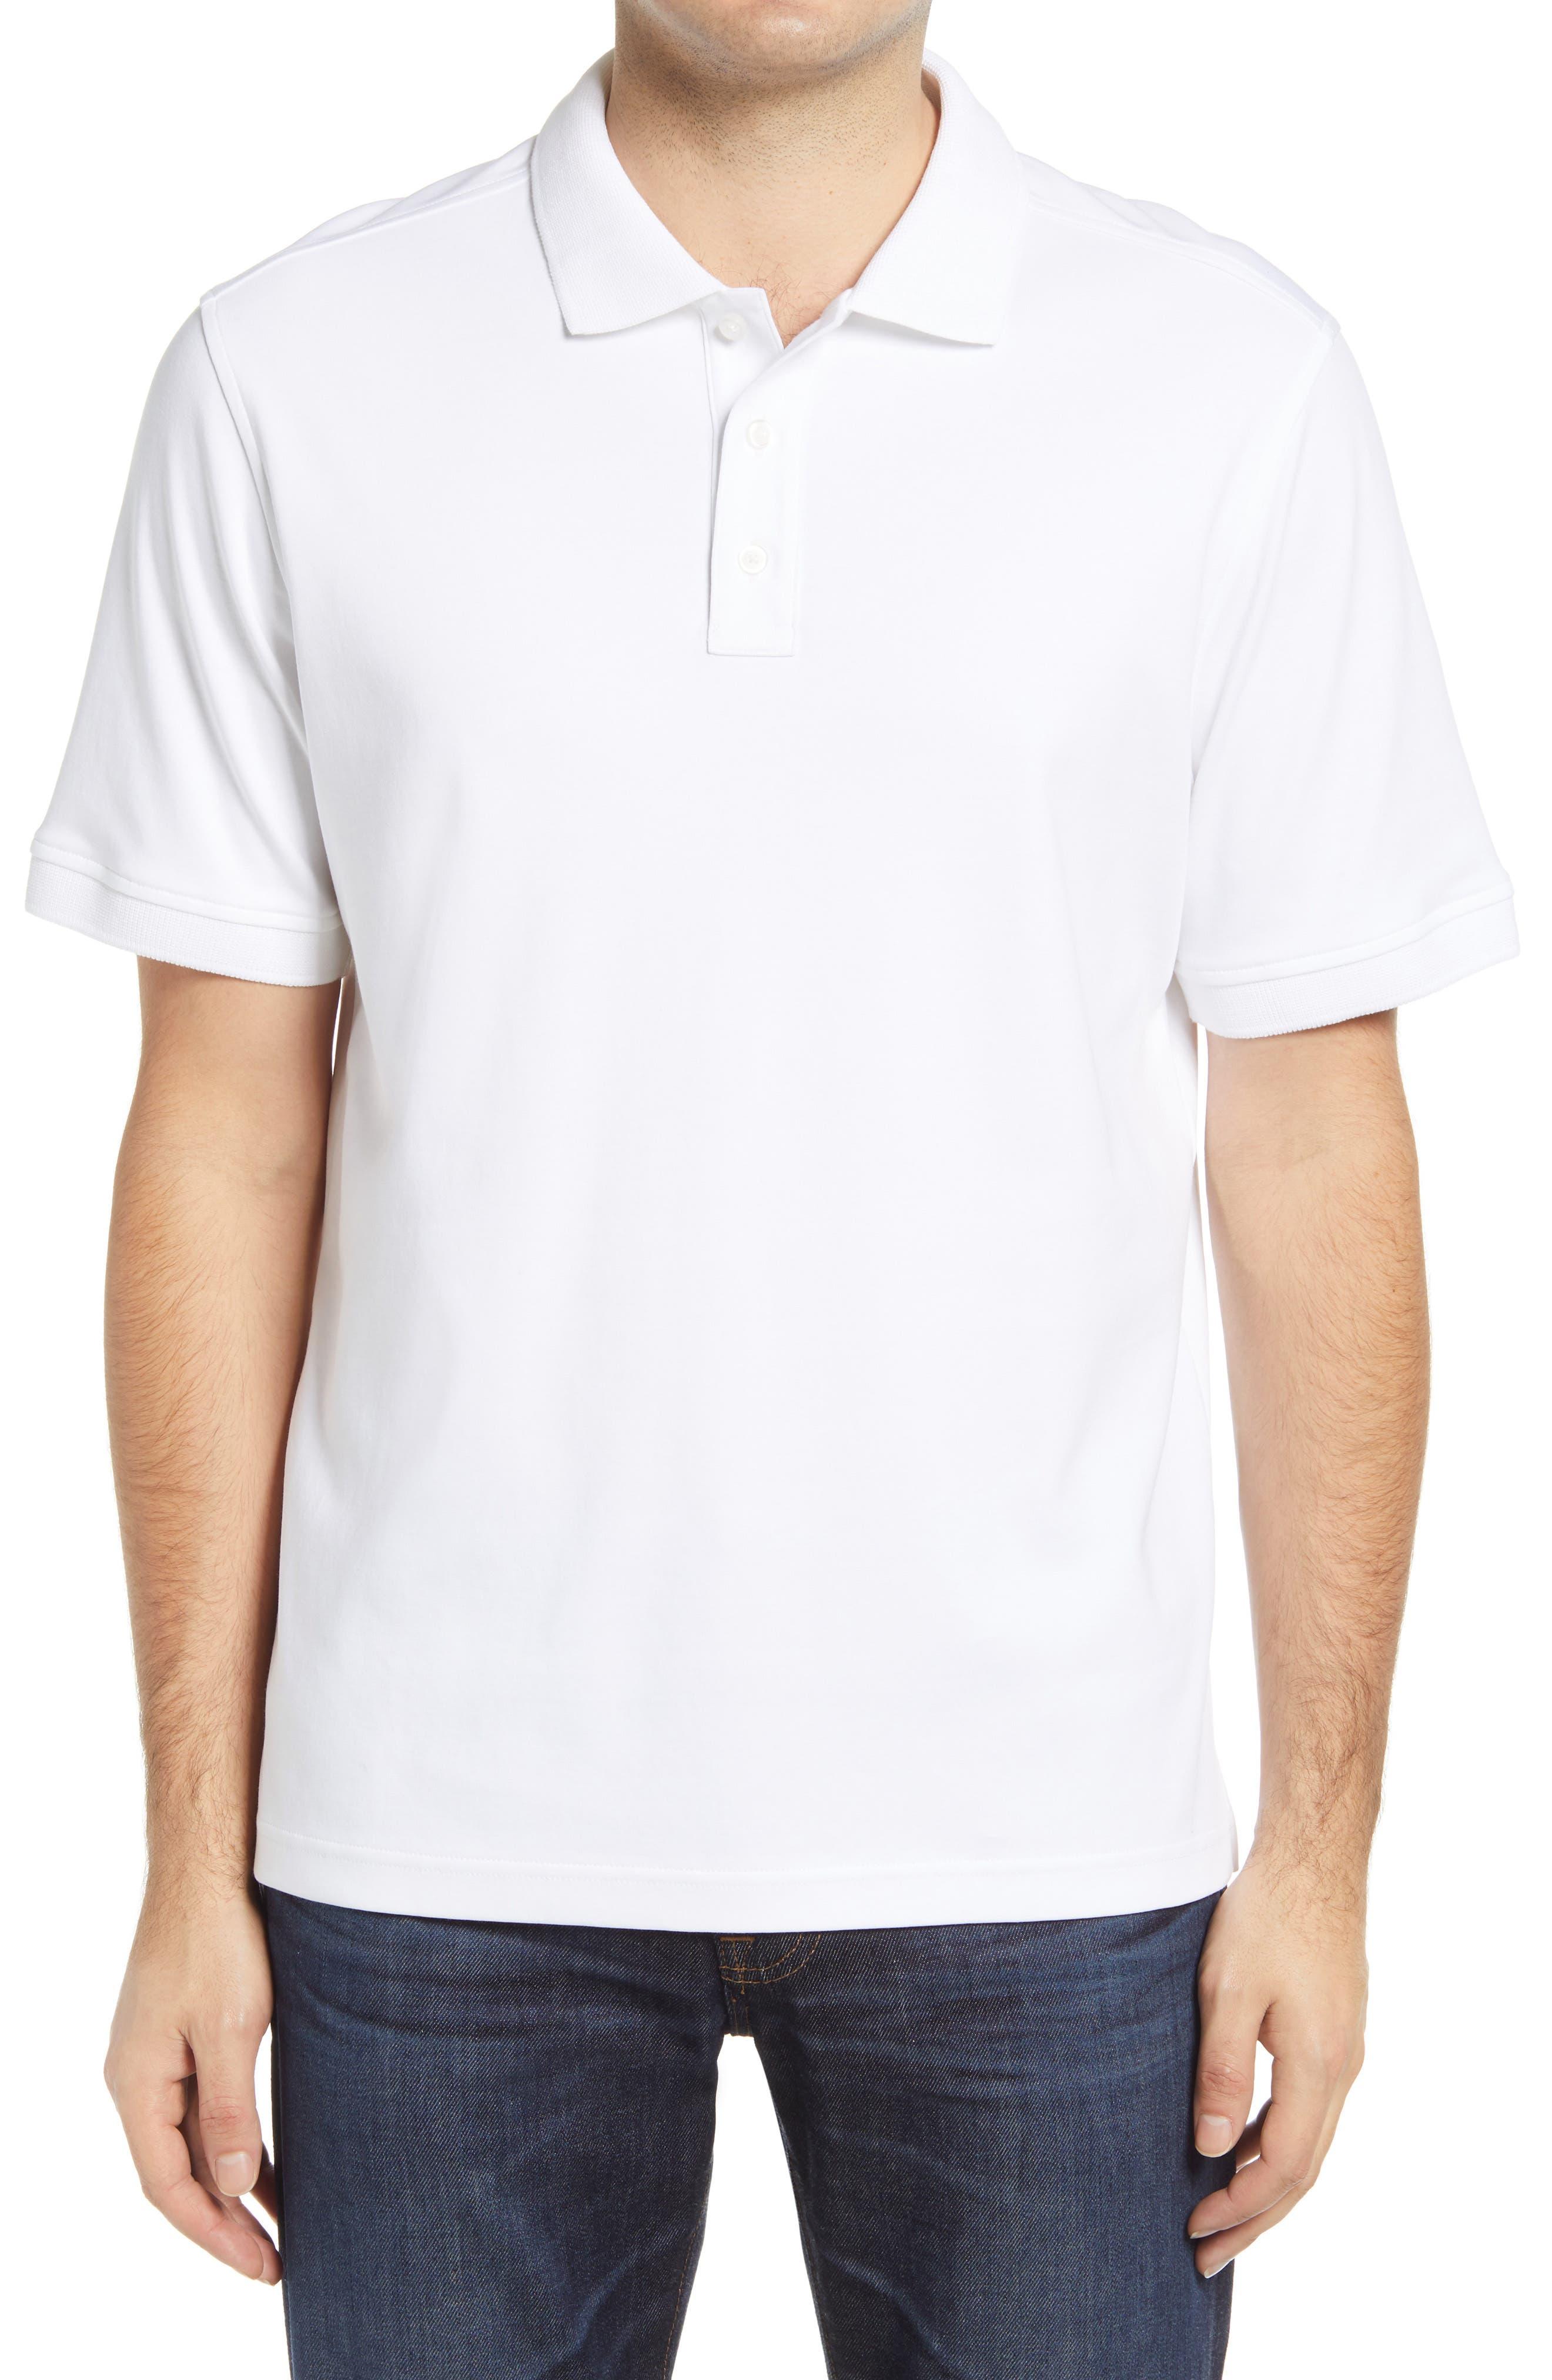 Men's White Polo Shirts | Nordstrom